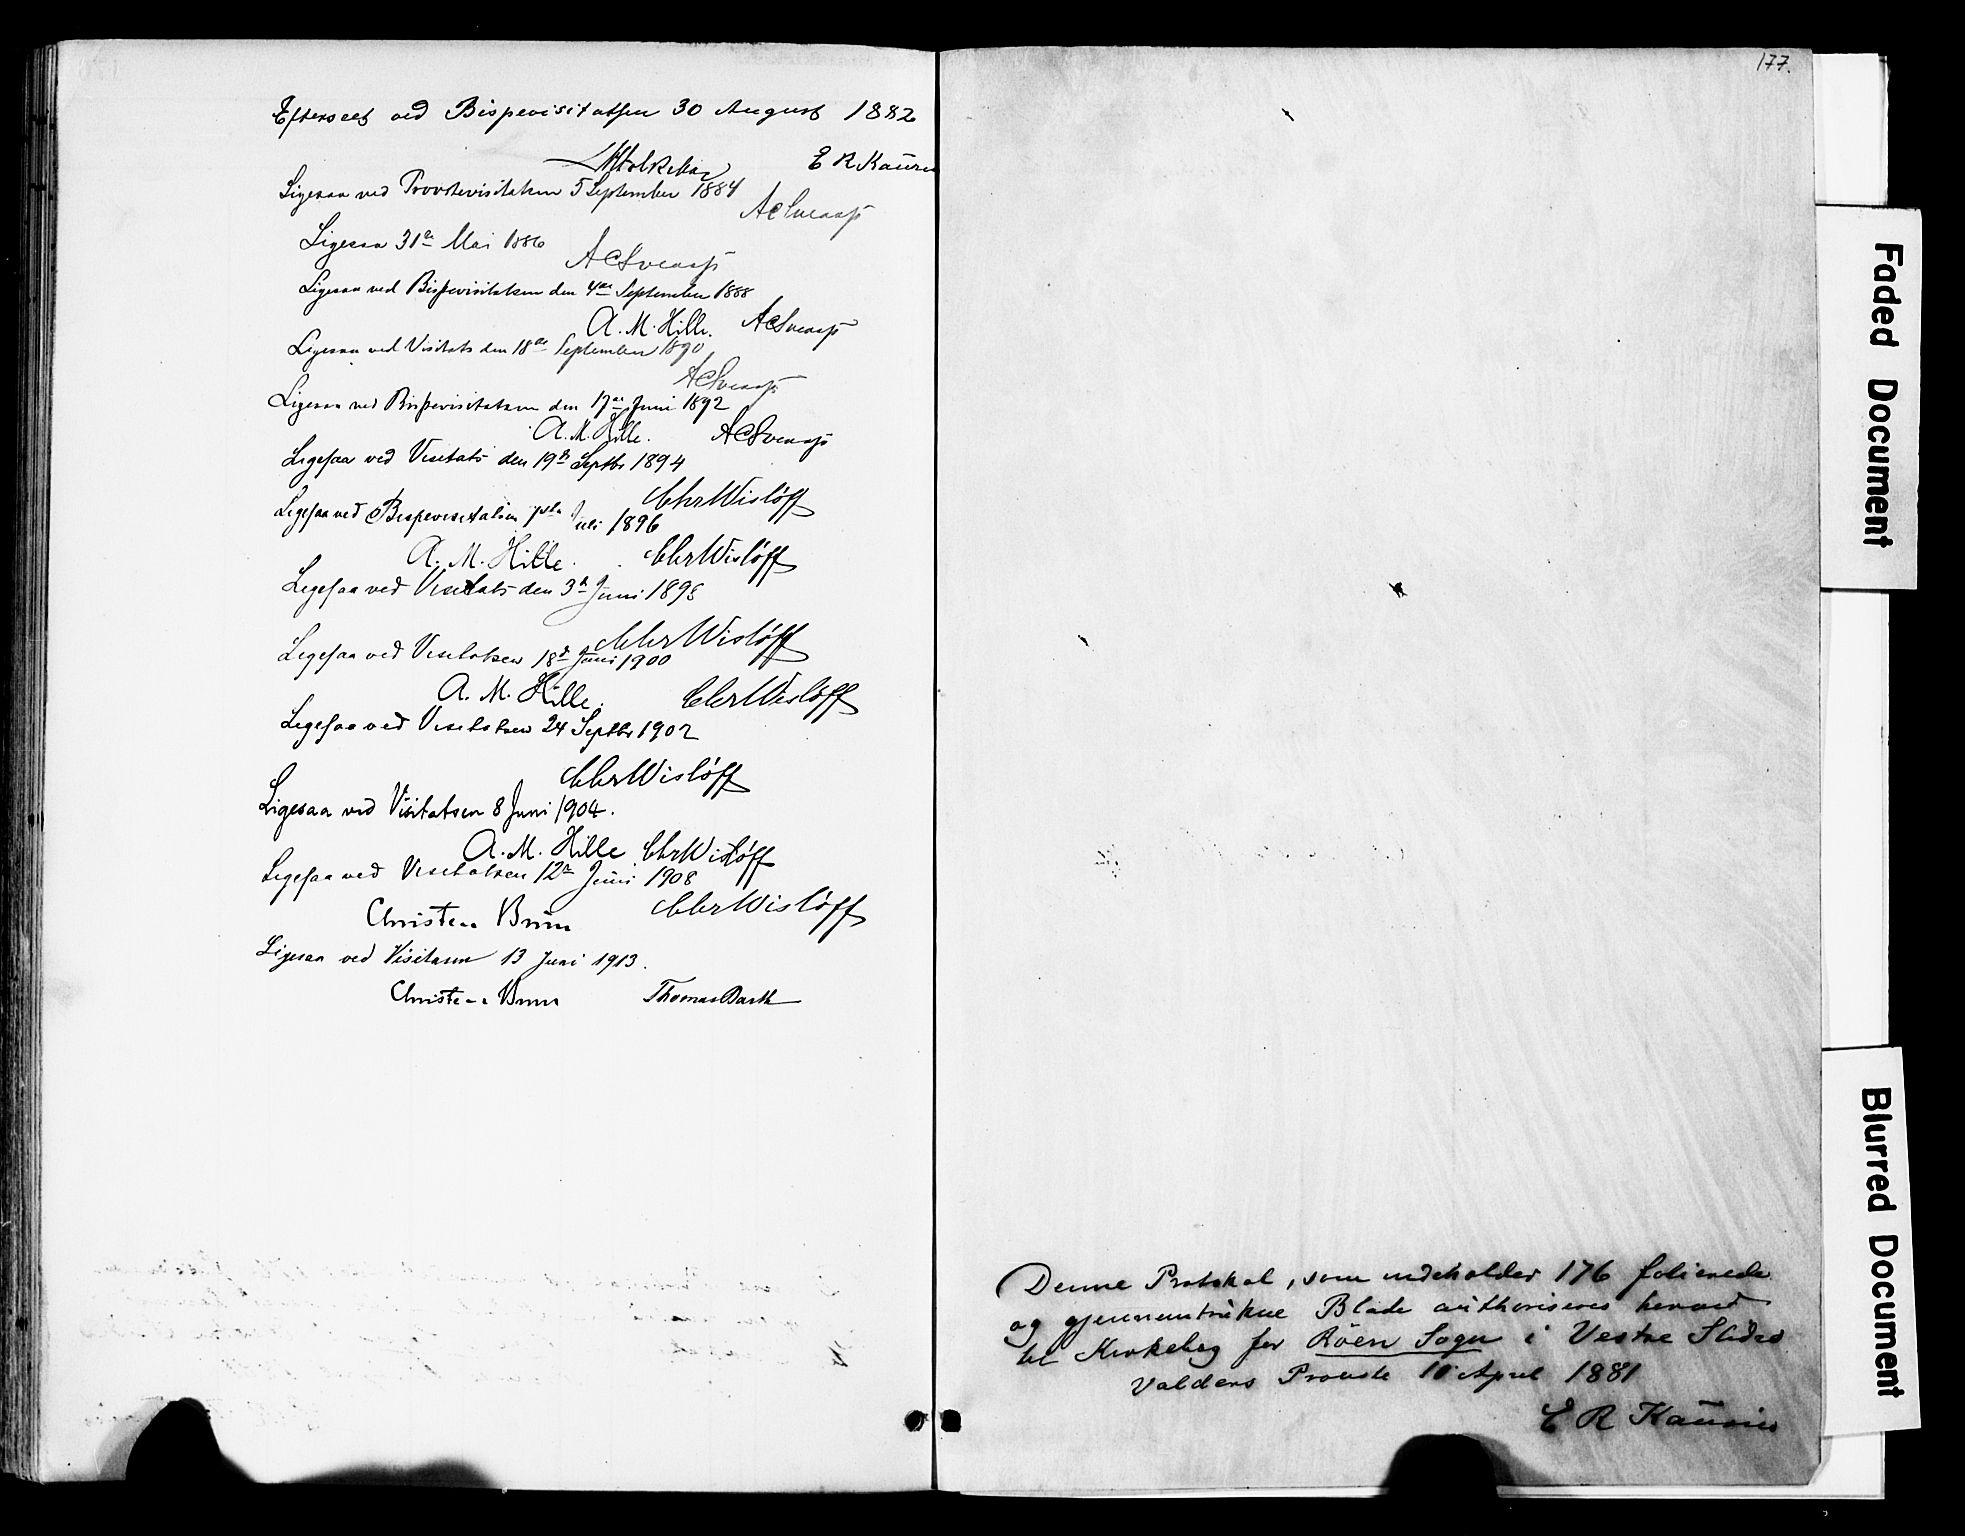 SAH, Vestre Slidre prestekontor, Ministerialbok nr. 6, 1881-1912, s. 177